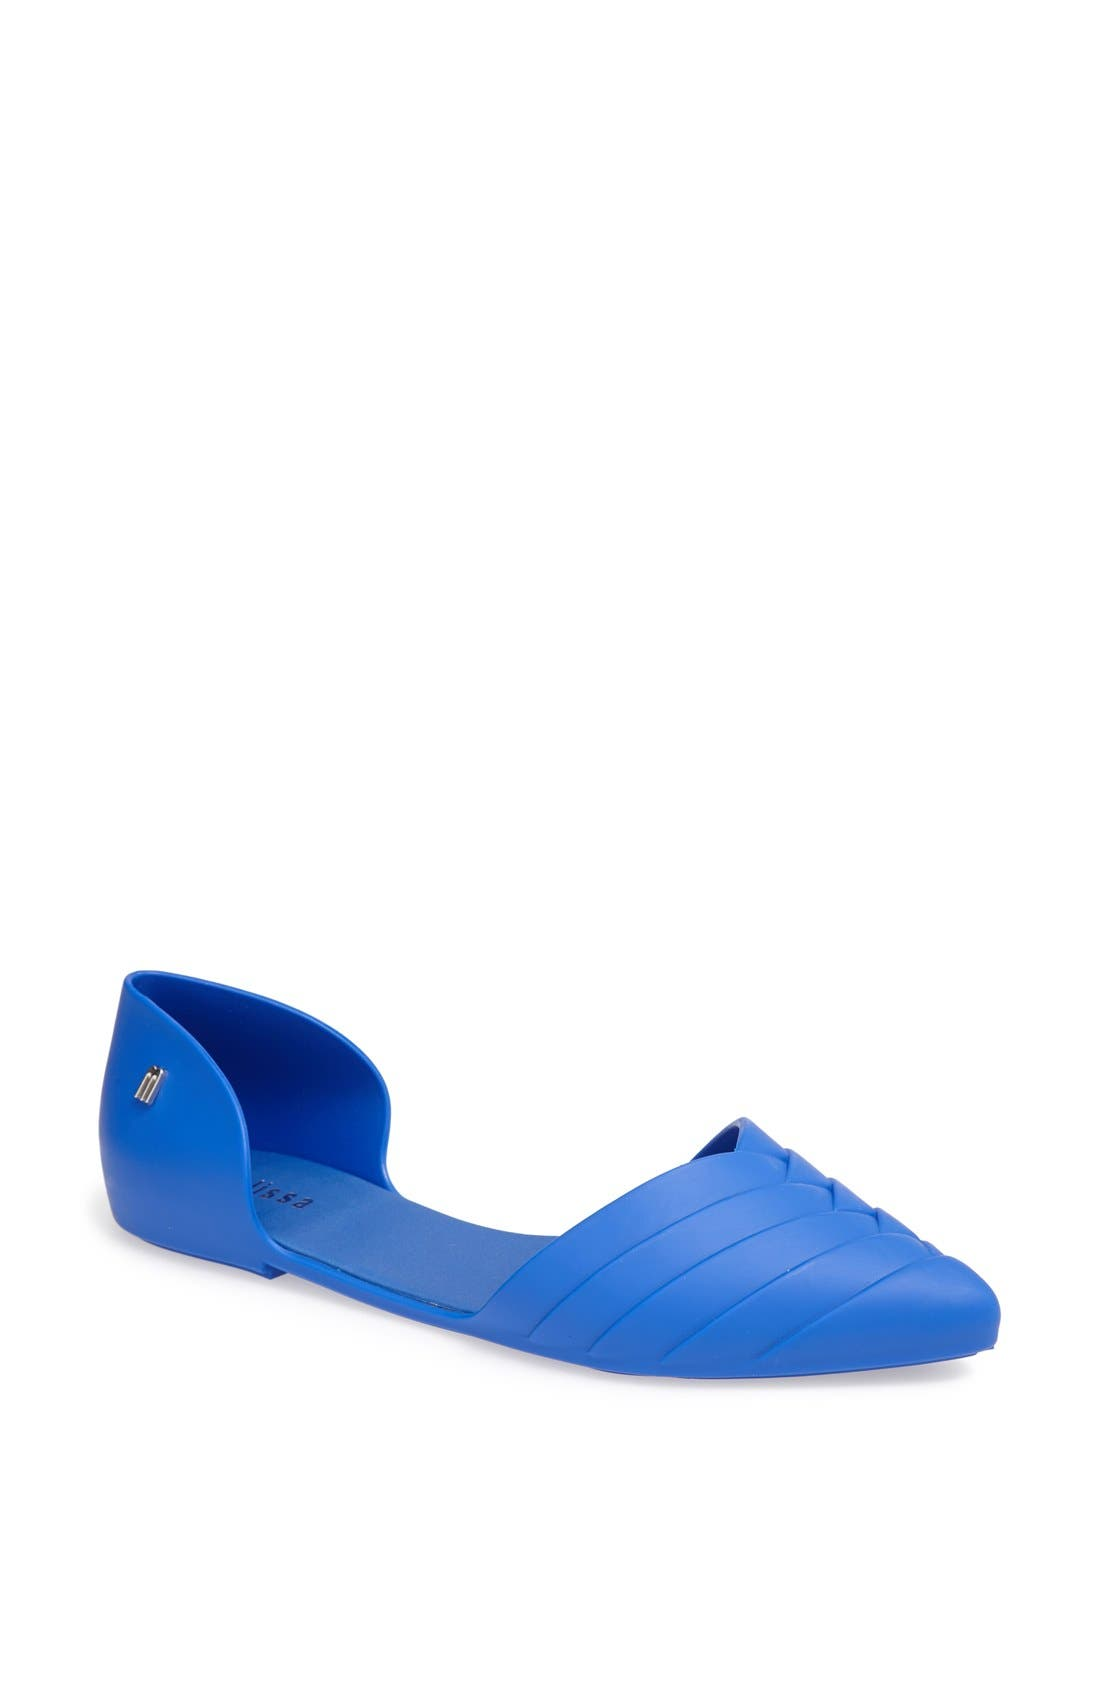 Main Image - Melissa 'Petal' Waterproof Pointy Toe Flat